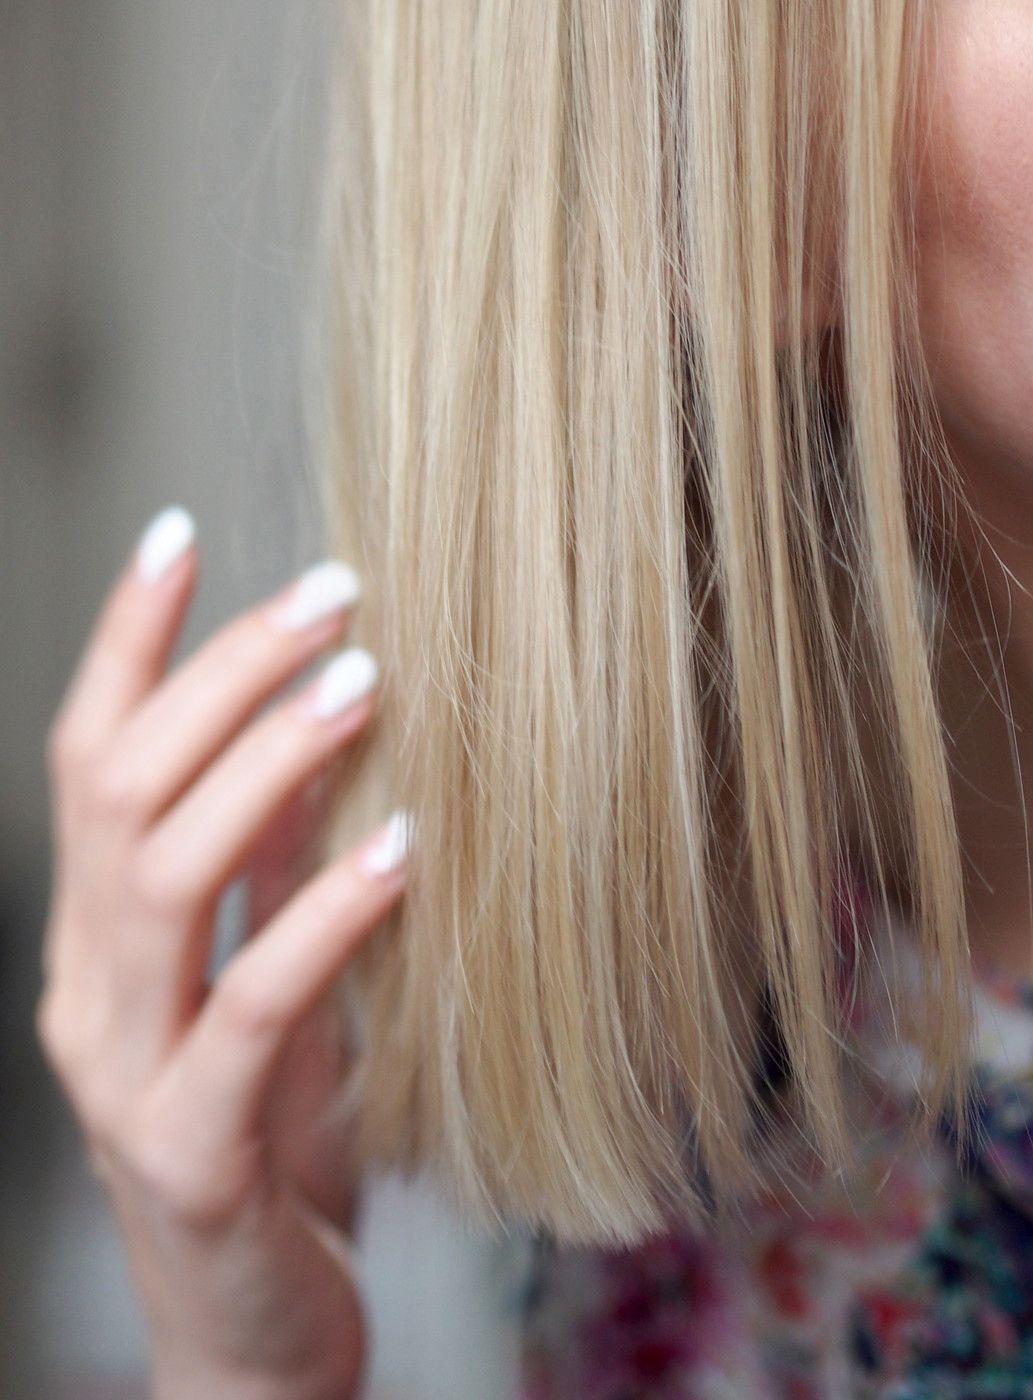 hiukset5.jpg